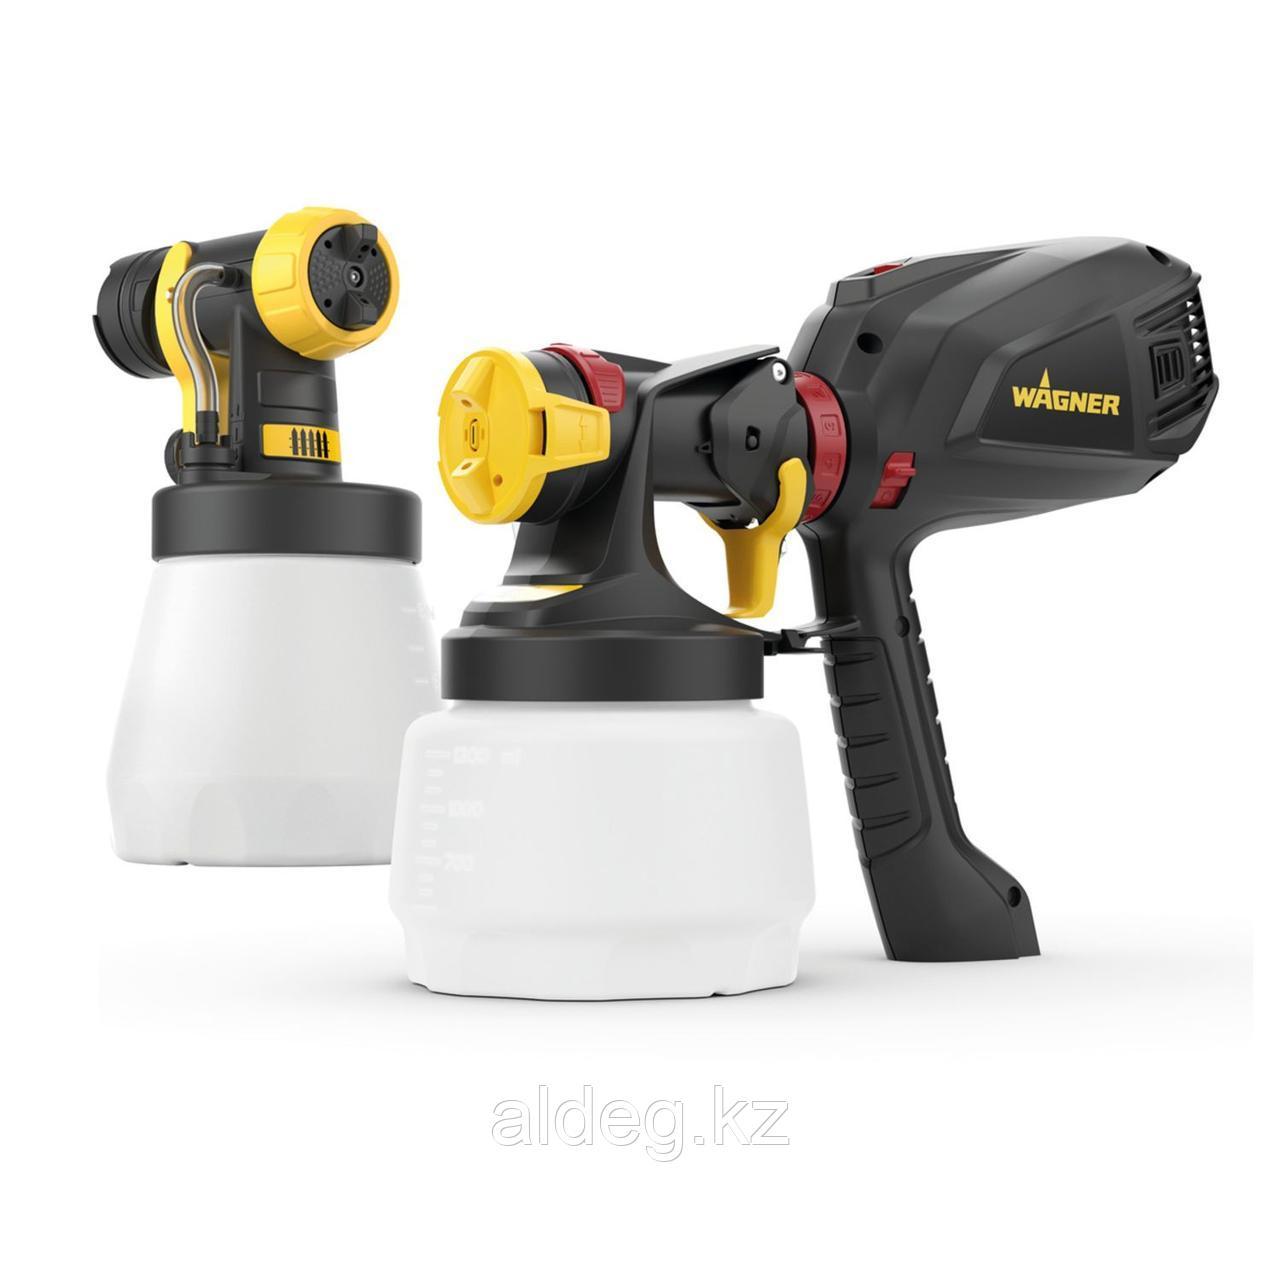 Электрический краскопульт Wagner Universal Sprayer W 590 Flexio